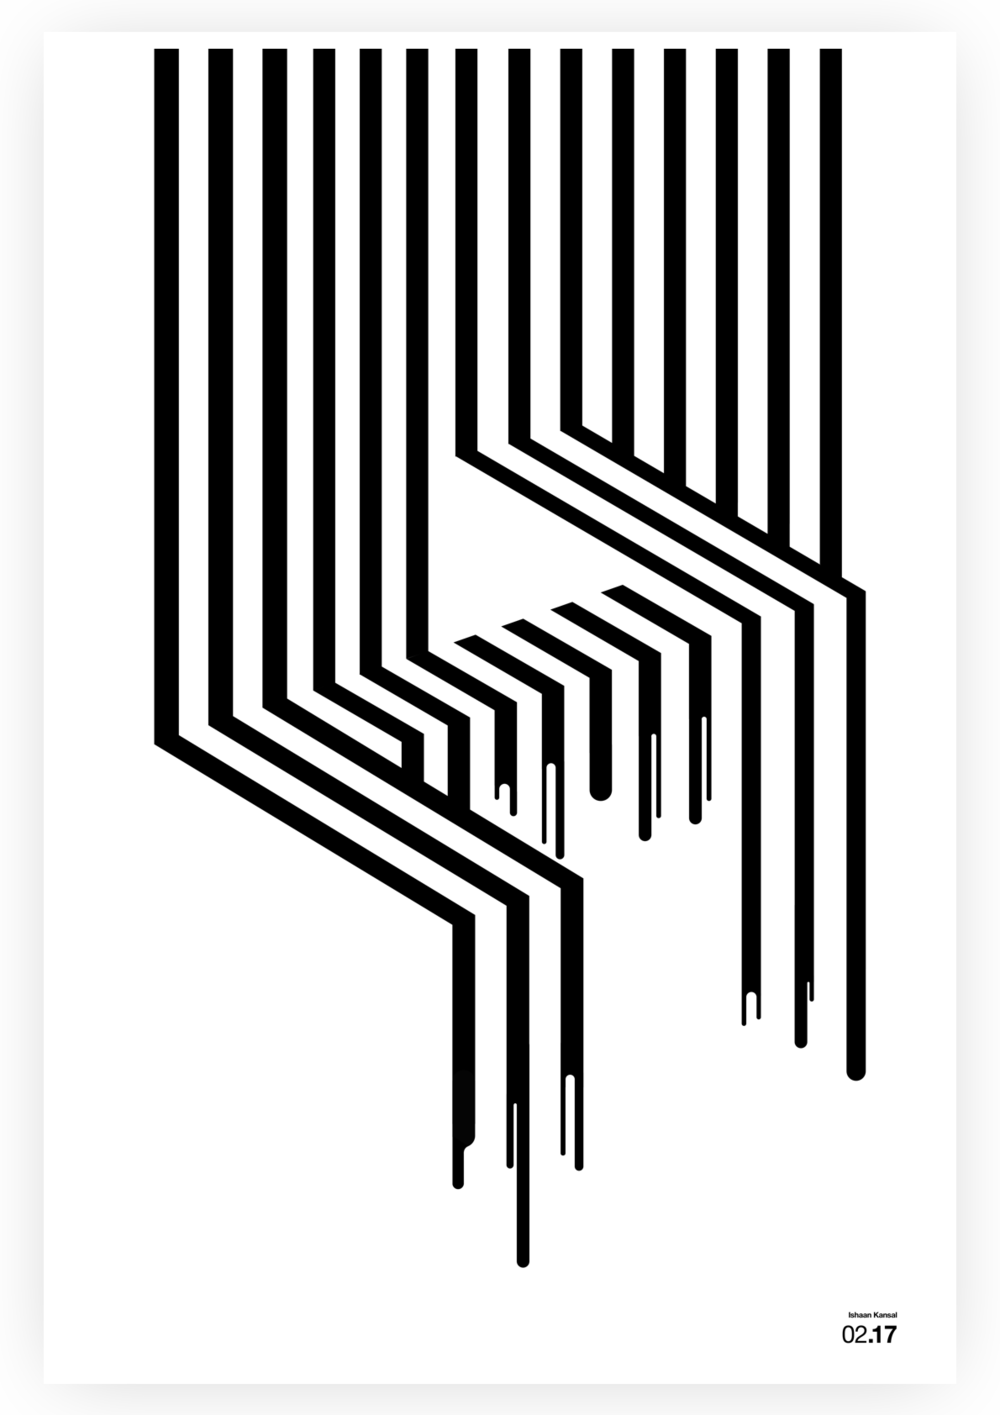 Letter Poster #1 - Letter Z